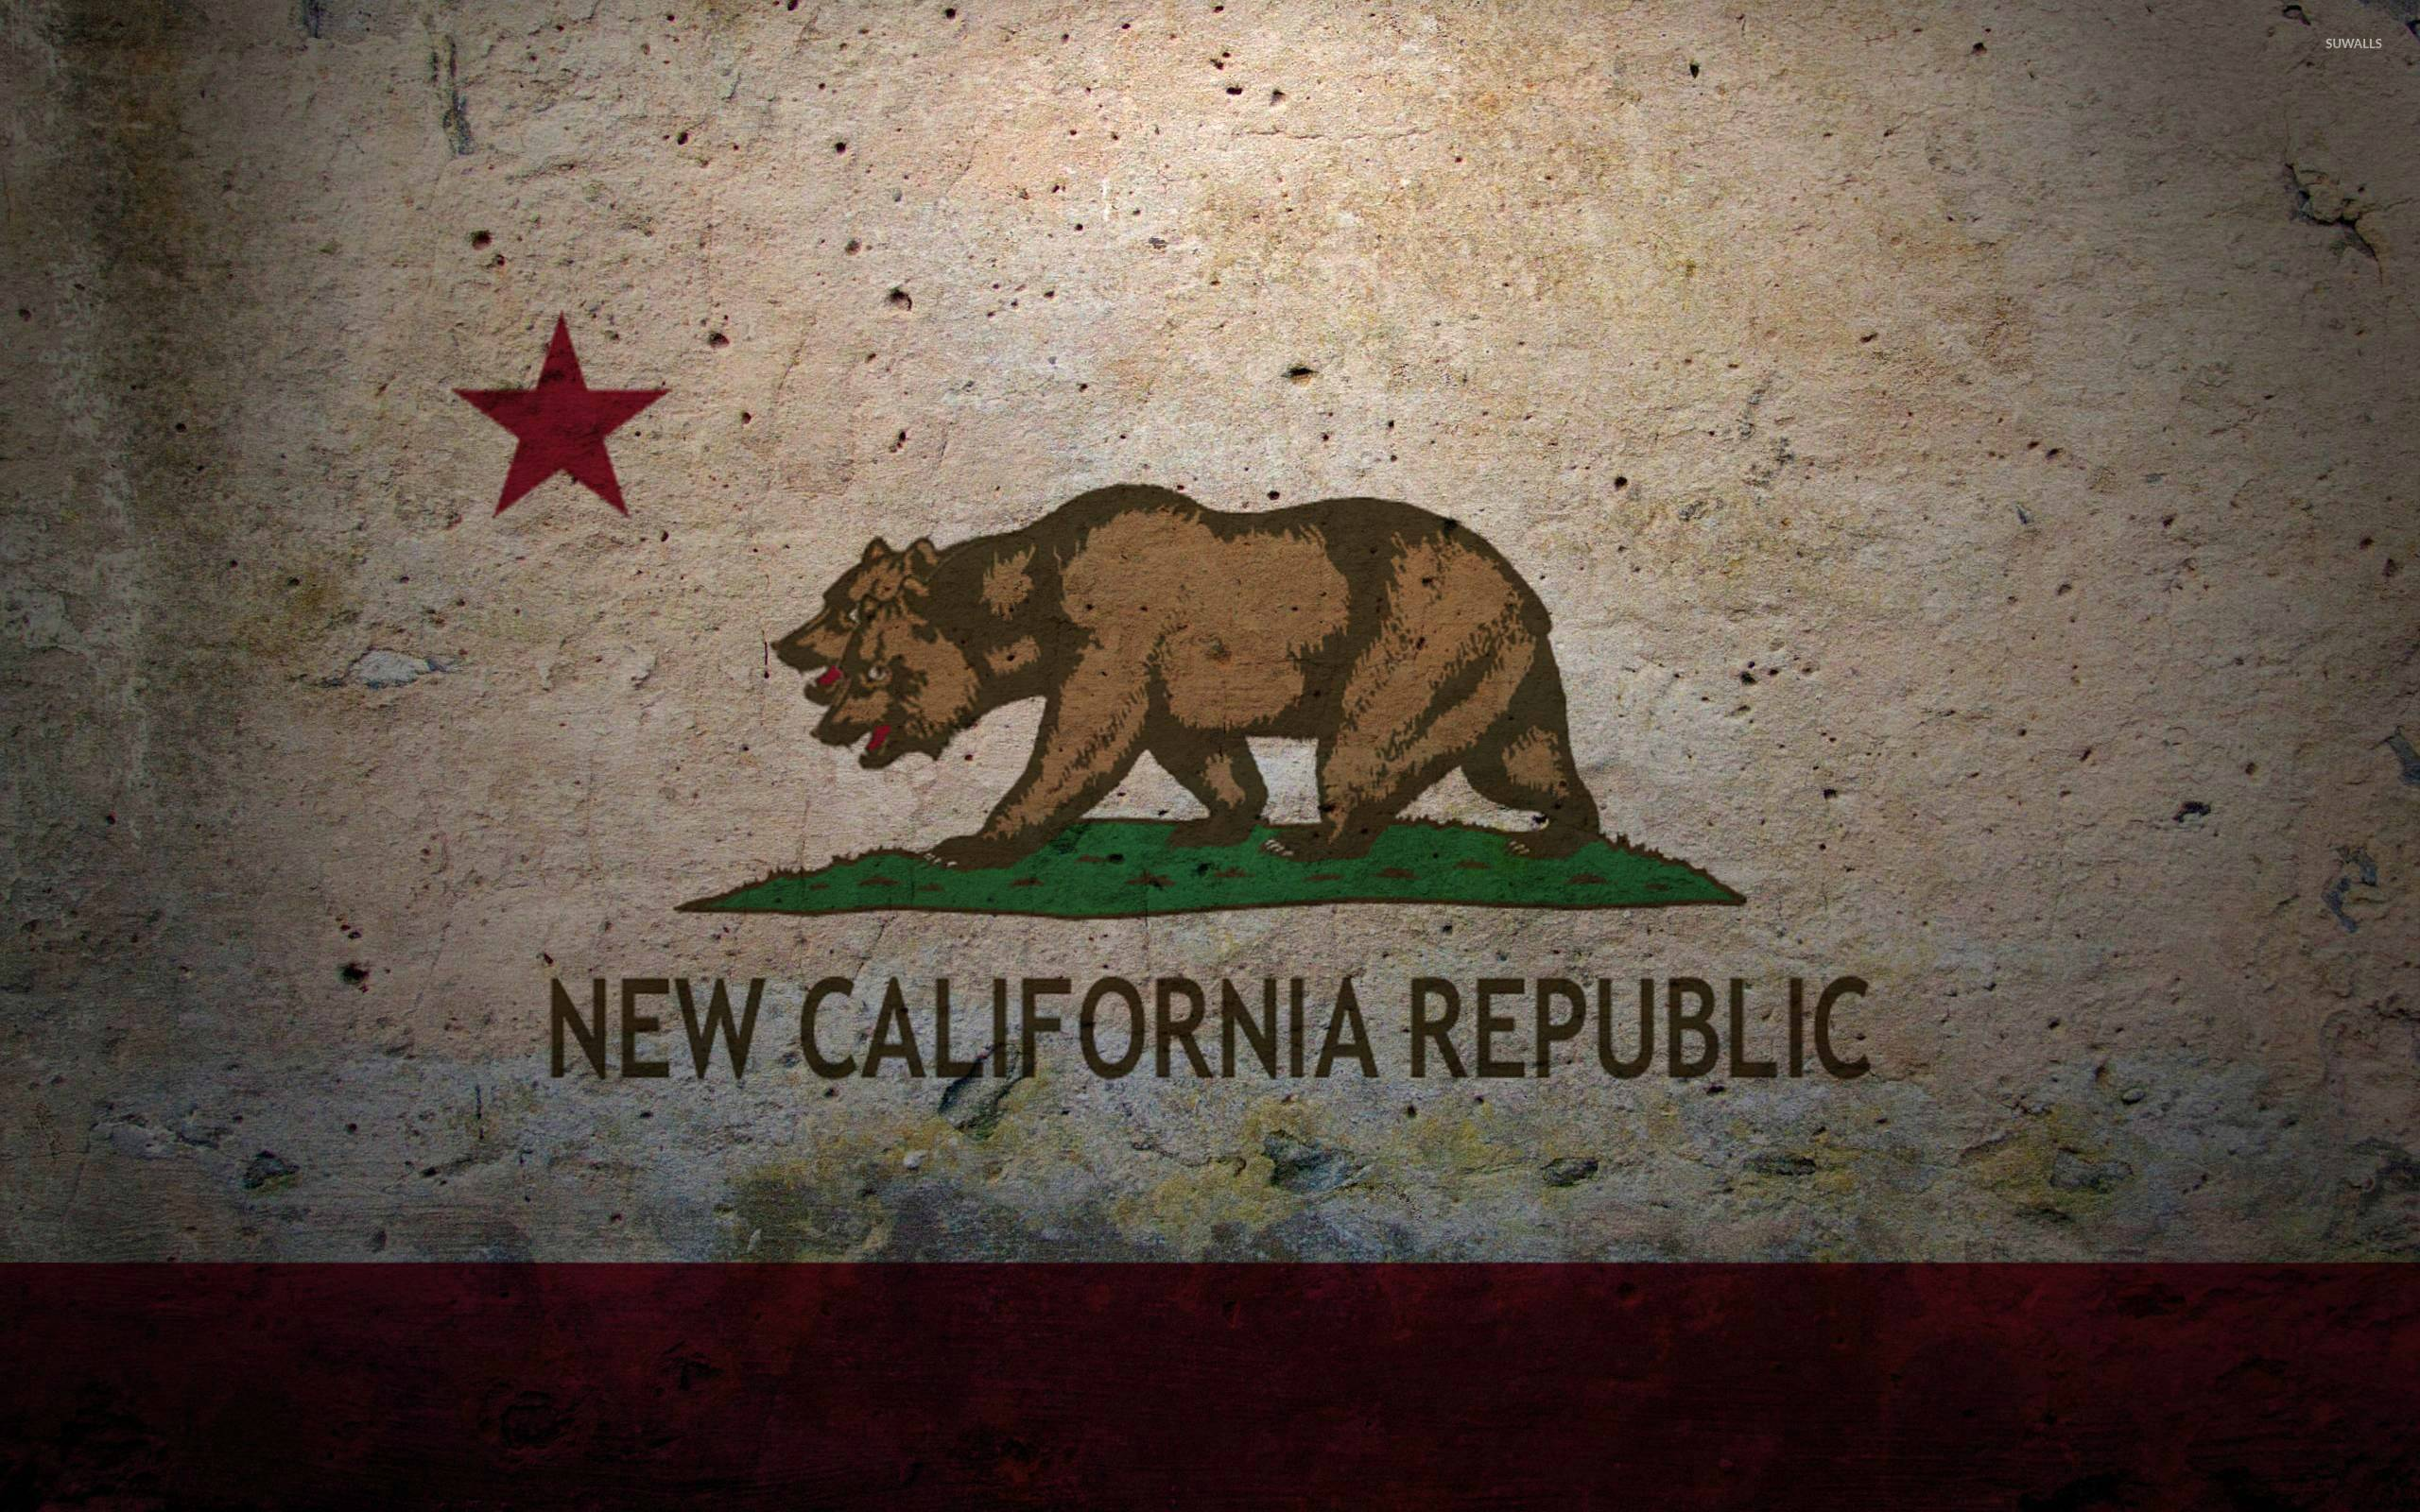 New California Republic from Fallout wallpaper